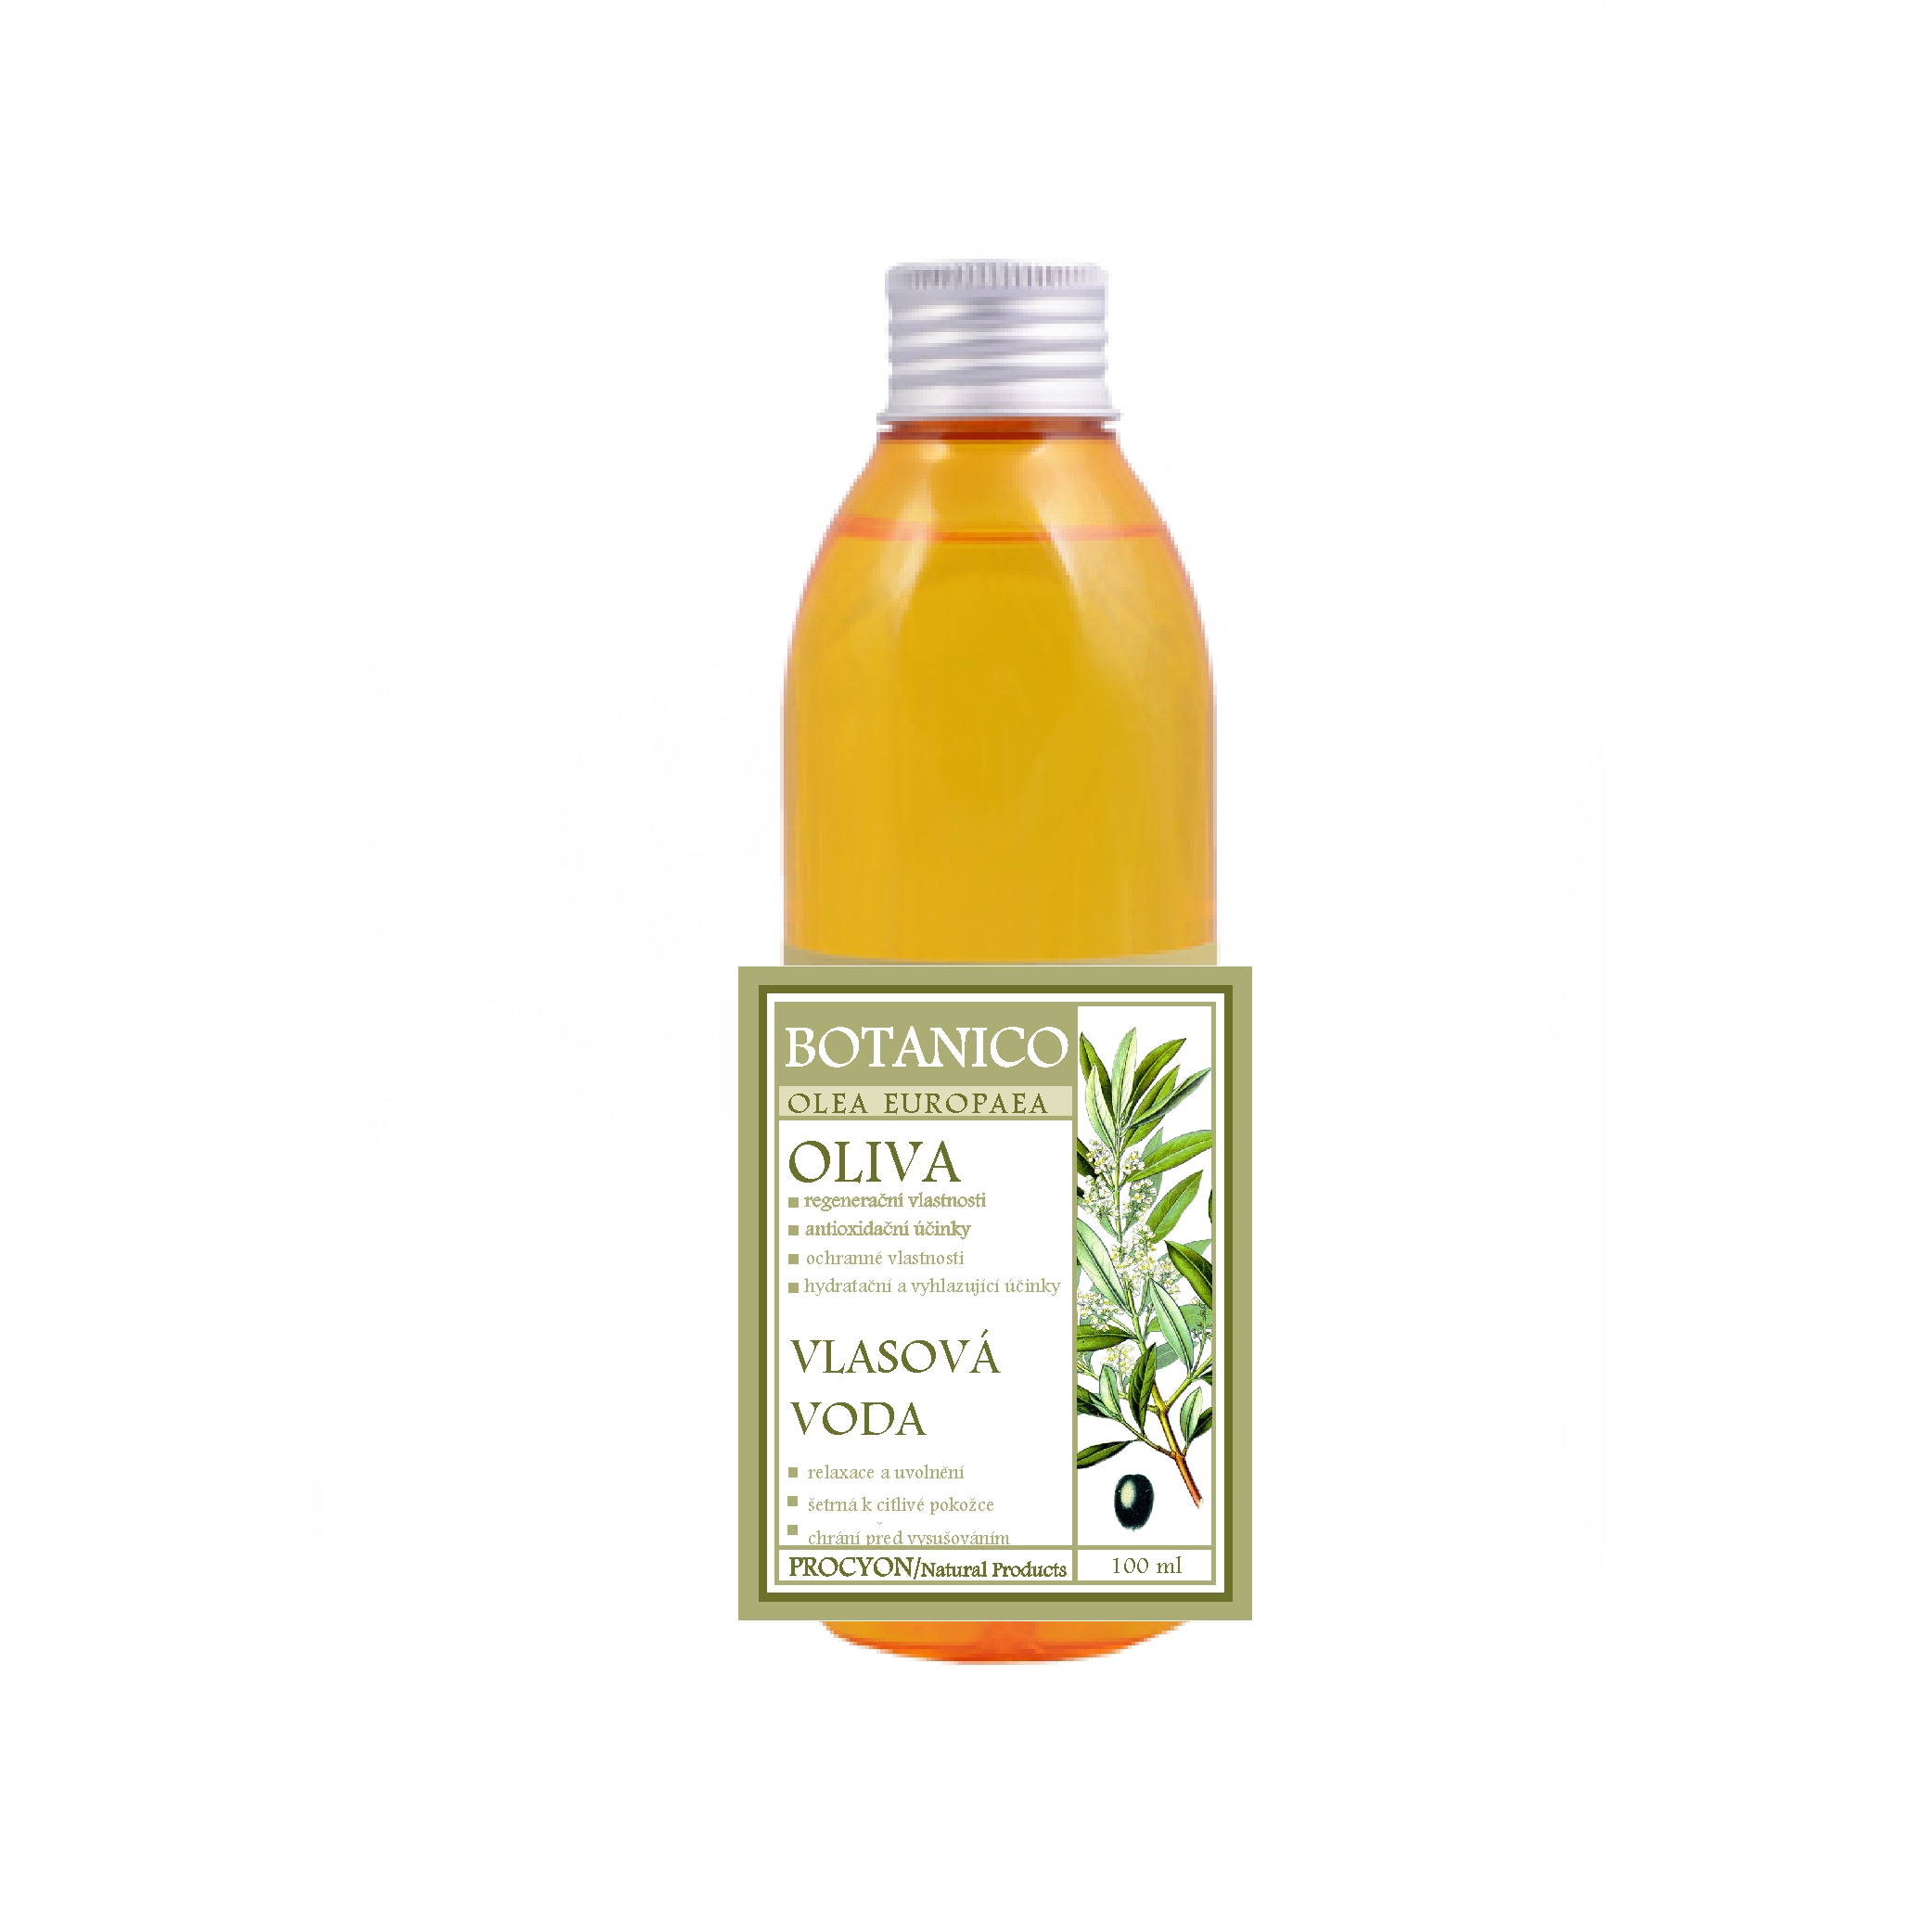 Vlasová voda / Oliva 100 ml